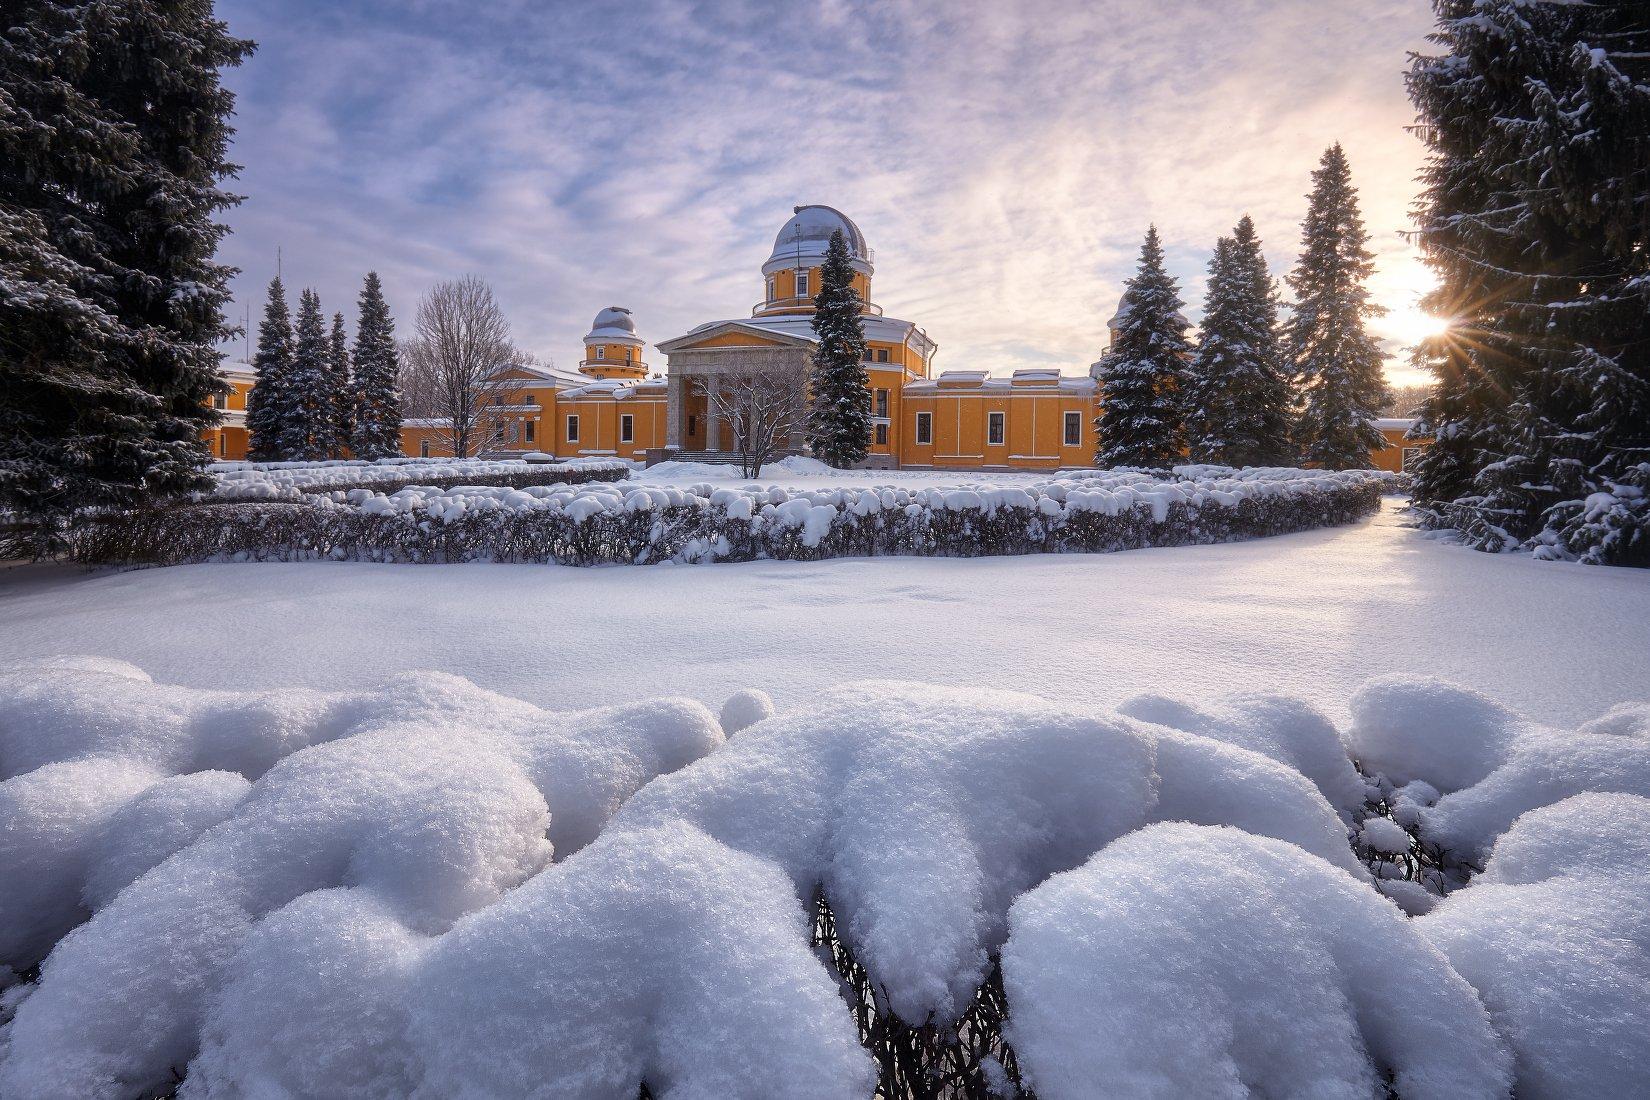 пулковская обсерватория, зима, пулково, снег, KrubeK